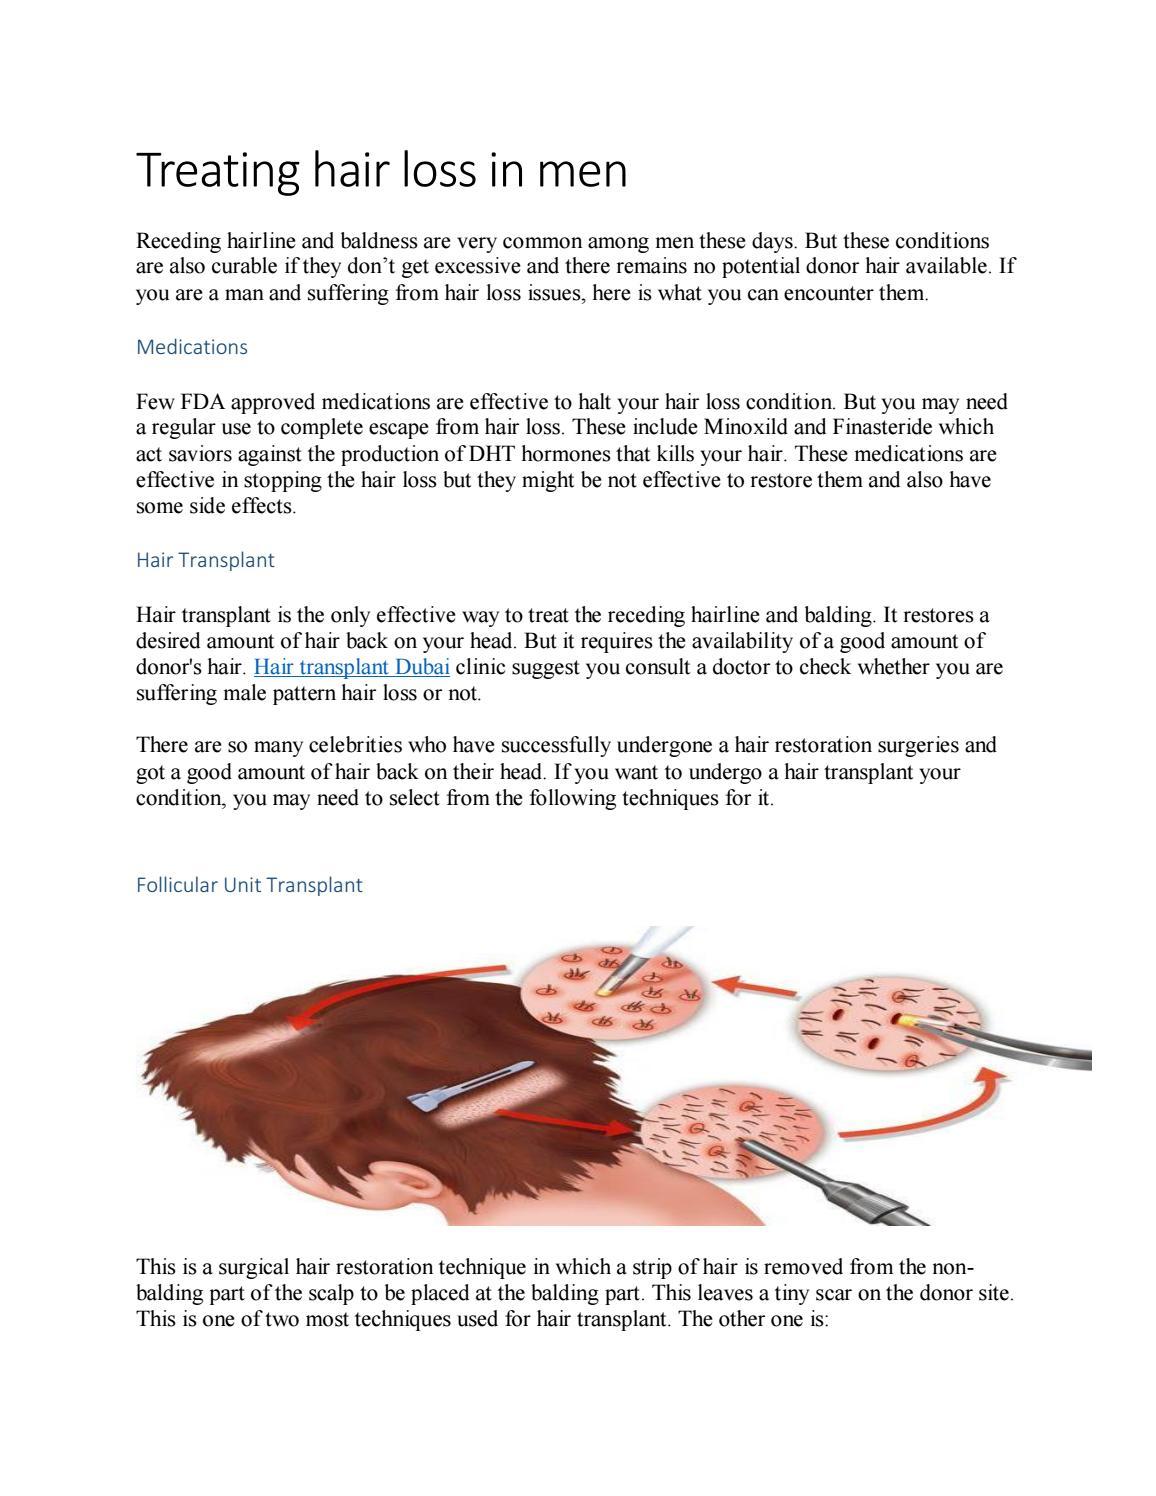 Treating Hair Loss In Men by saddaf khan369 - issuu